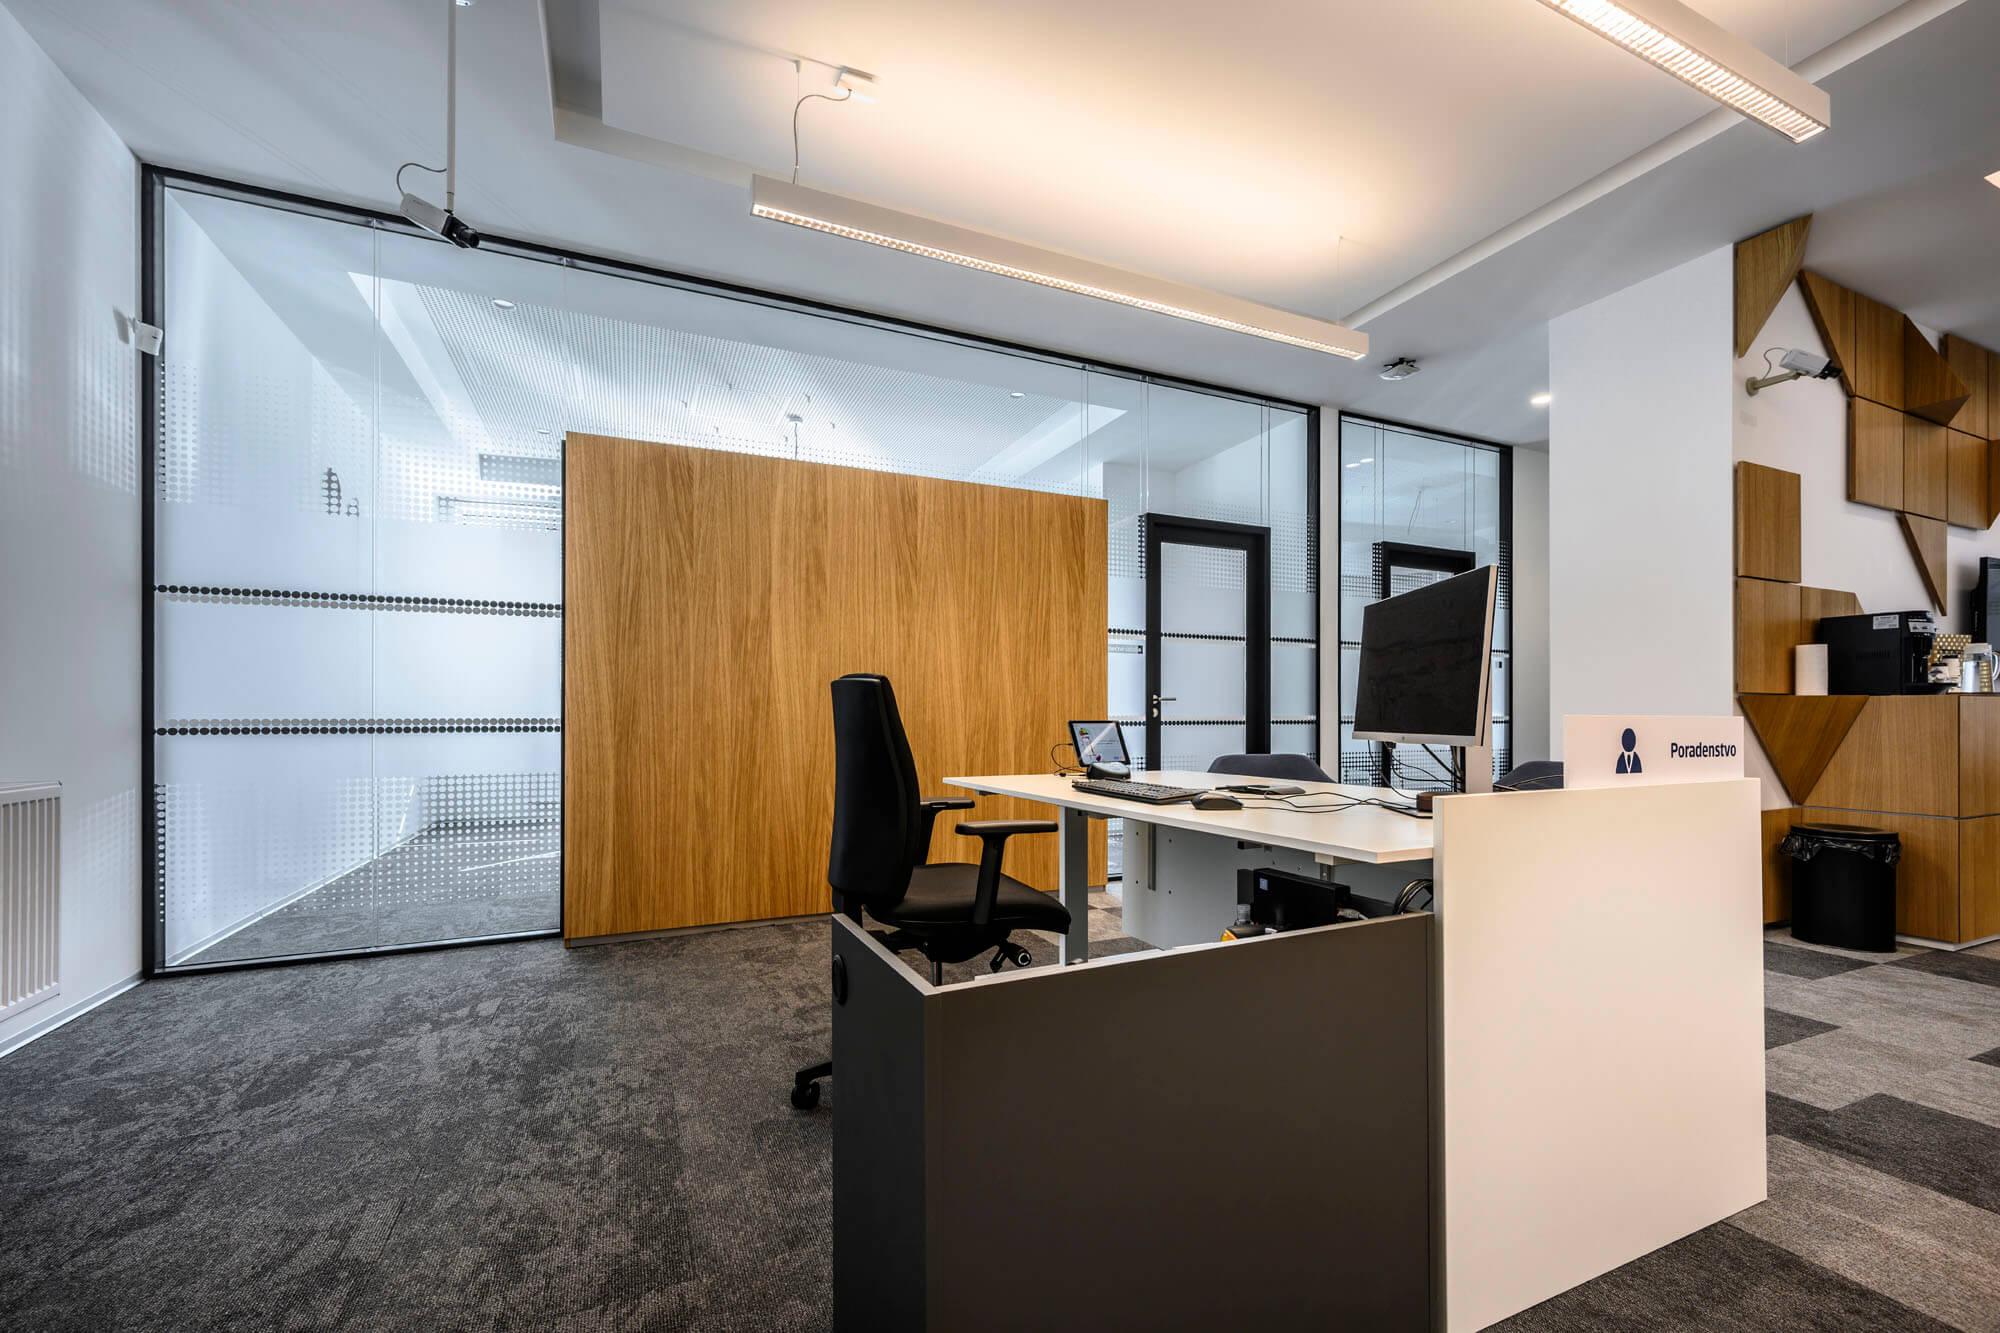 MICRA II bringt Eleganz in jedes Büro